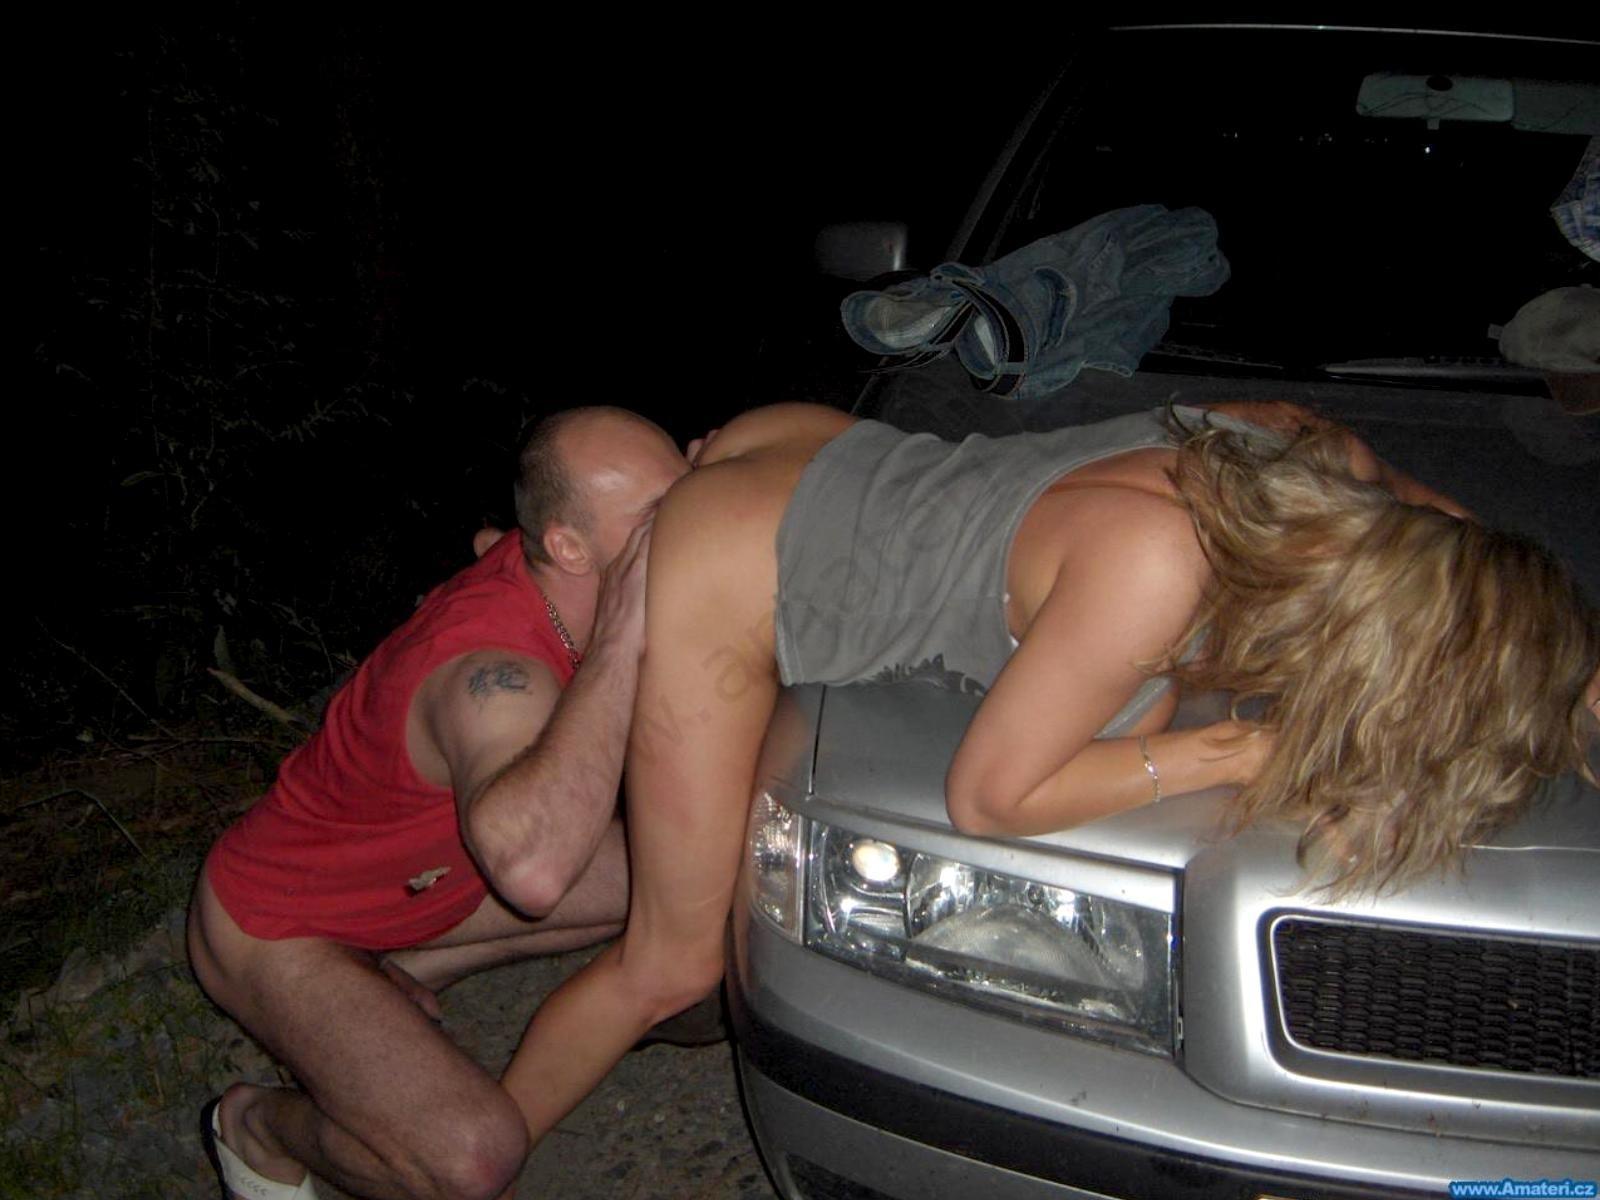 rødhåret kusse sex viborg